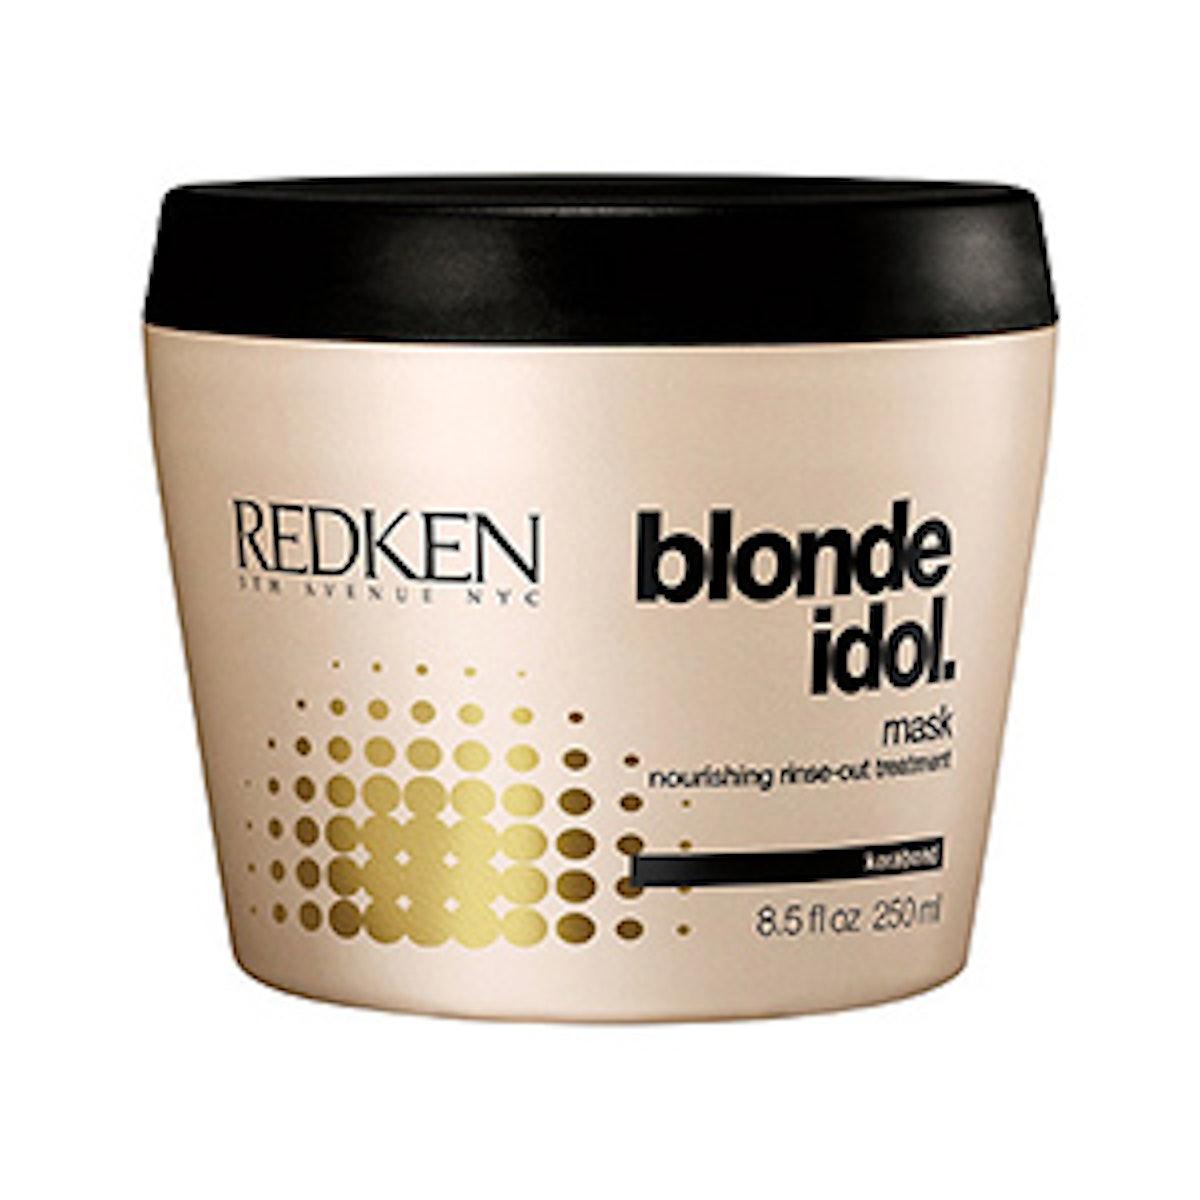 Blonde Idol Hair Mask